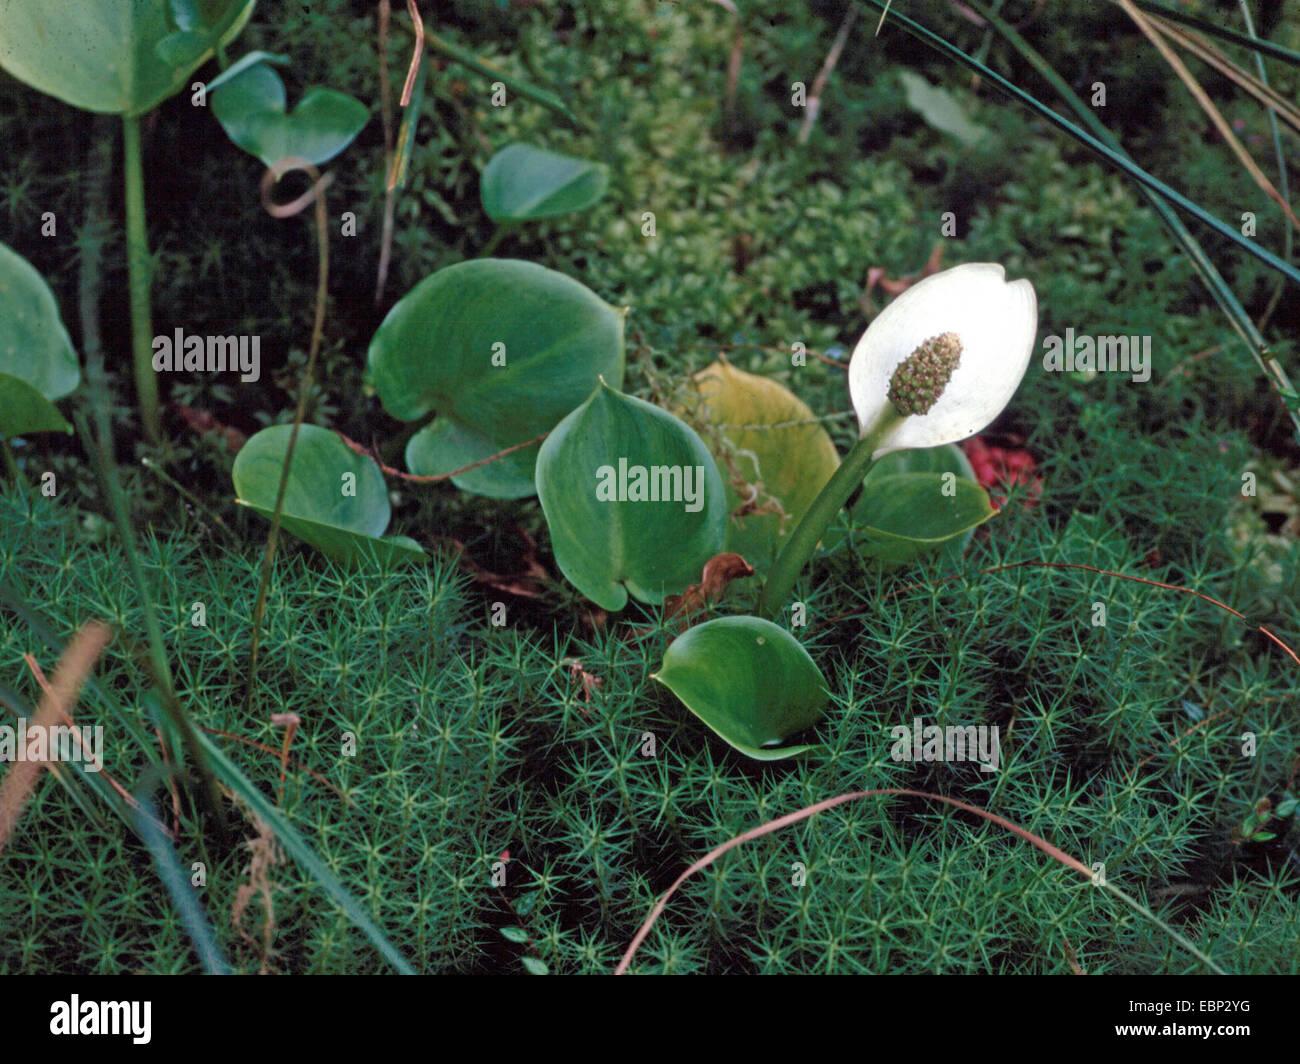 bog arum, wild calla (Calla palustris), blooming, Germany, North Rhine-Westphalia - Stock Image